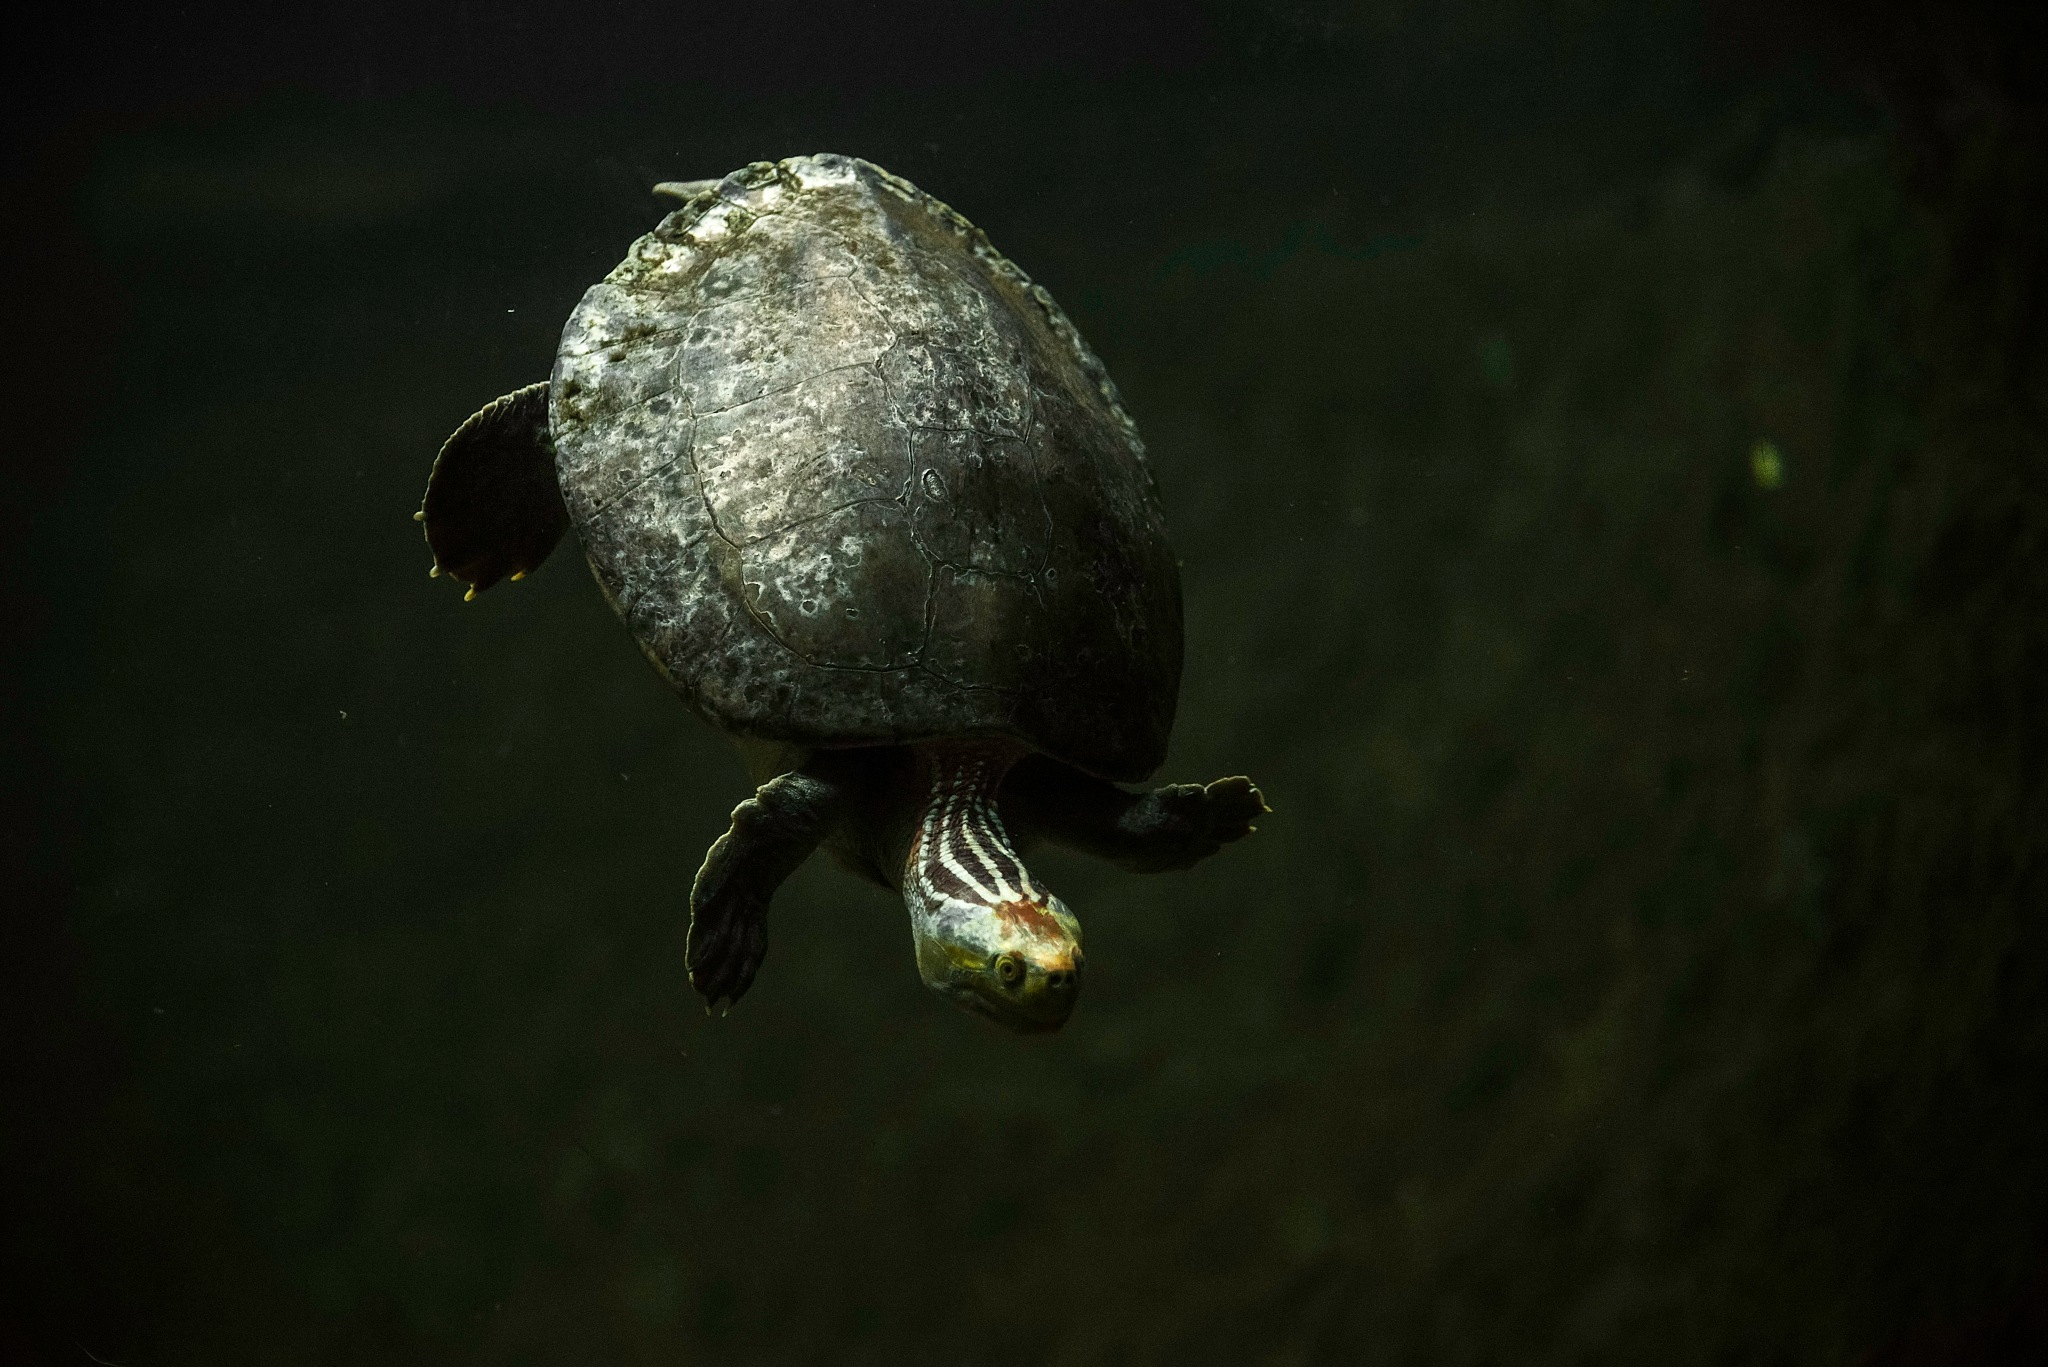 Tortoise by DevaVinoth